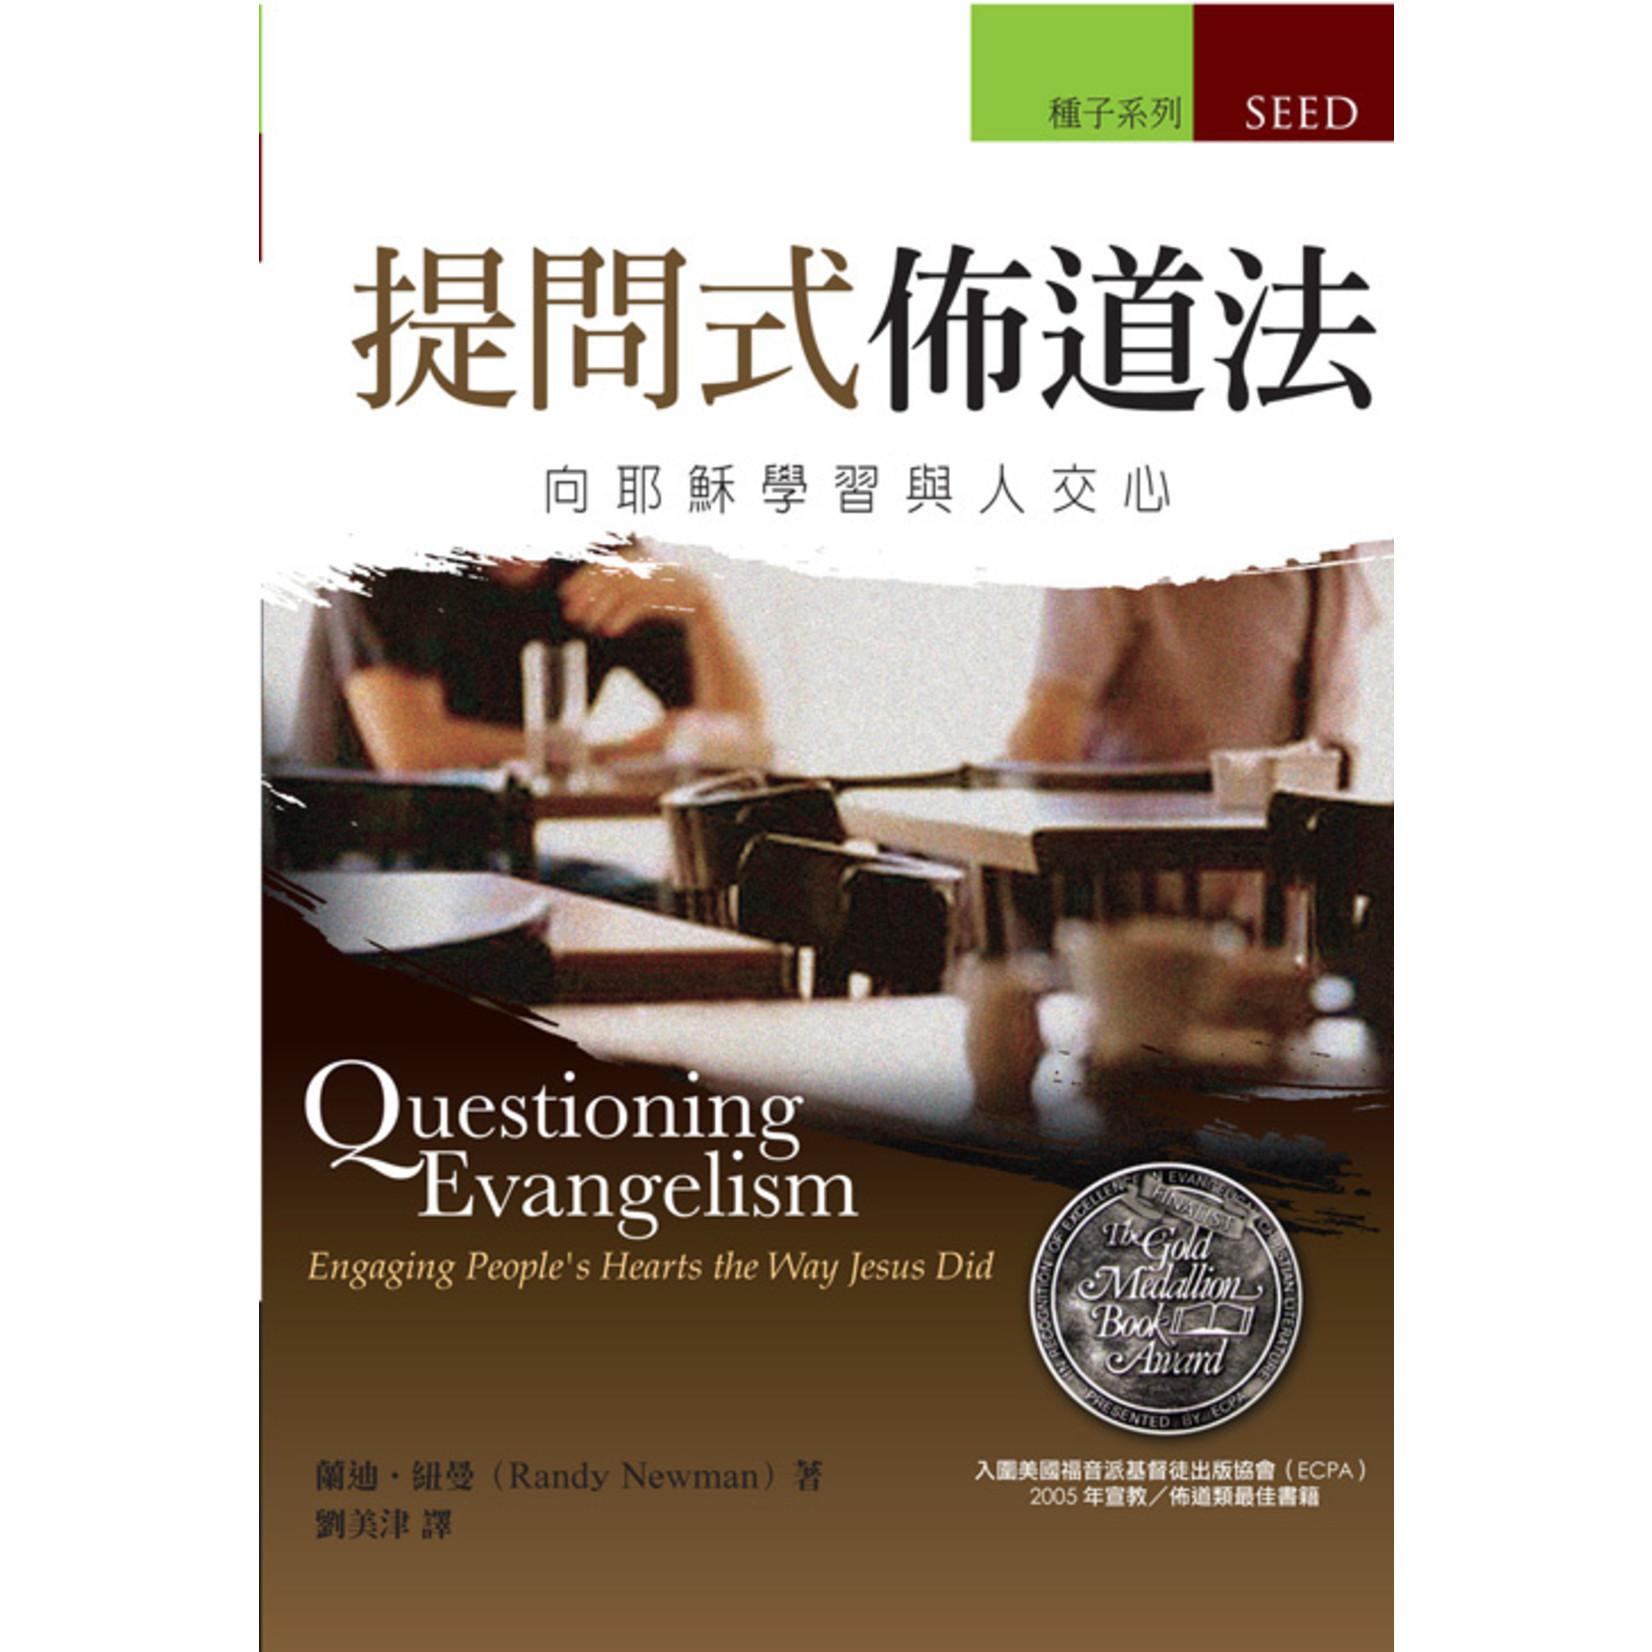 美國麥種傳道會 AKOWCM 提問式佈道法:向耶穌學習與人交心 Questioning Evangelism: Engaging People's Hearts the Way Jesus Did